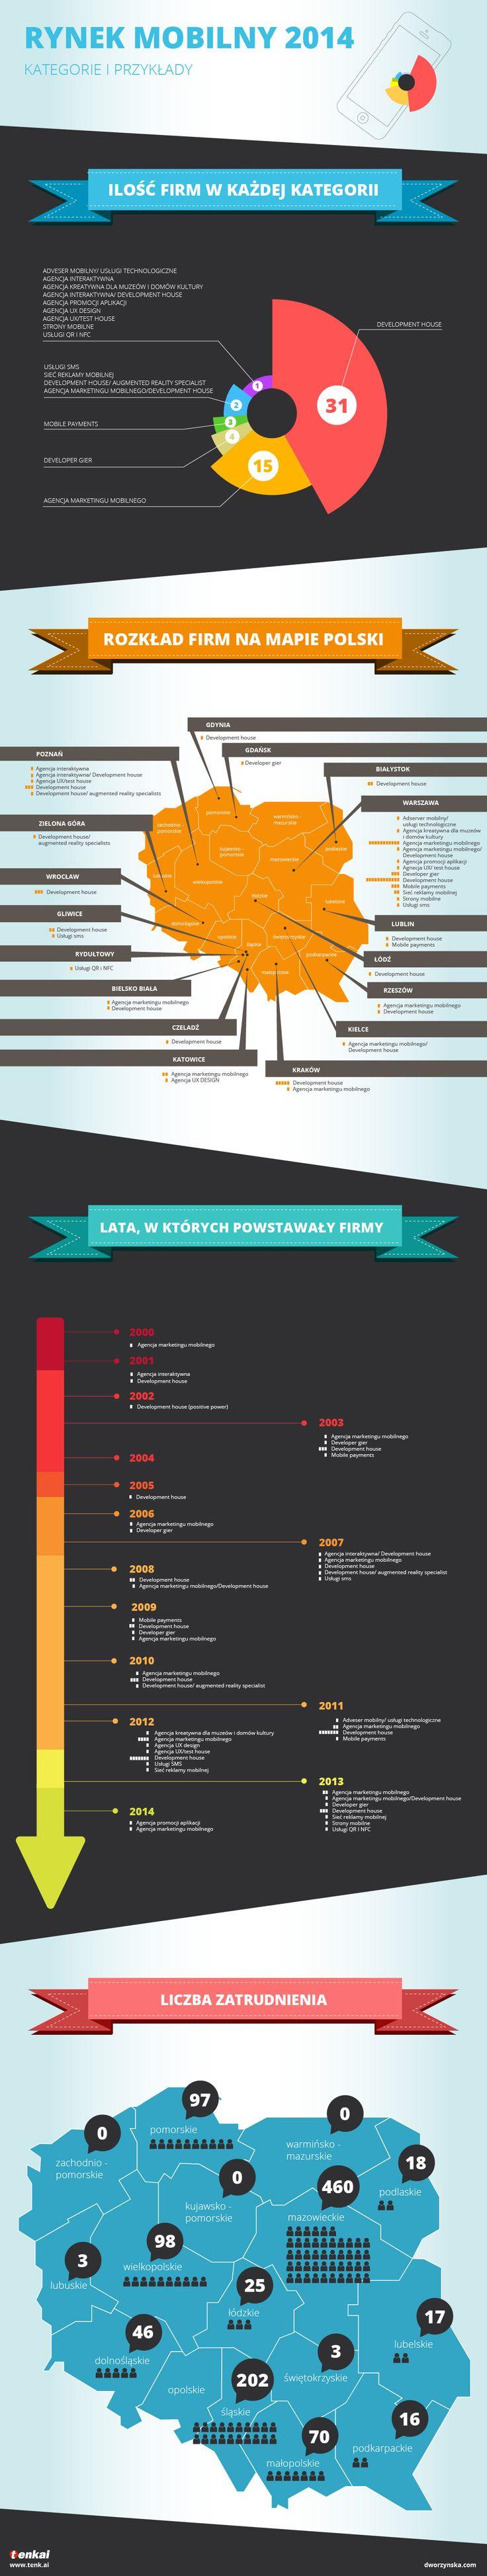 infografika_rynek mobile dane_ dworzynska_beta